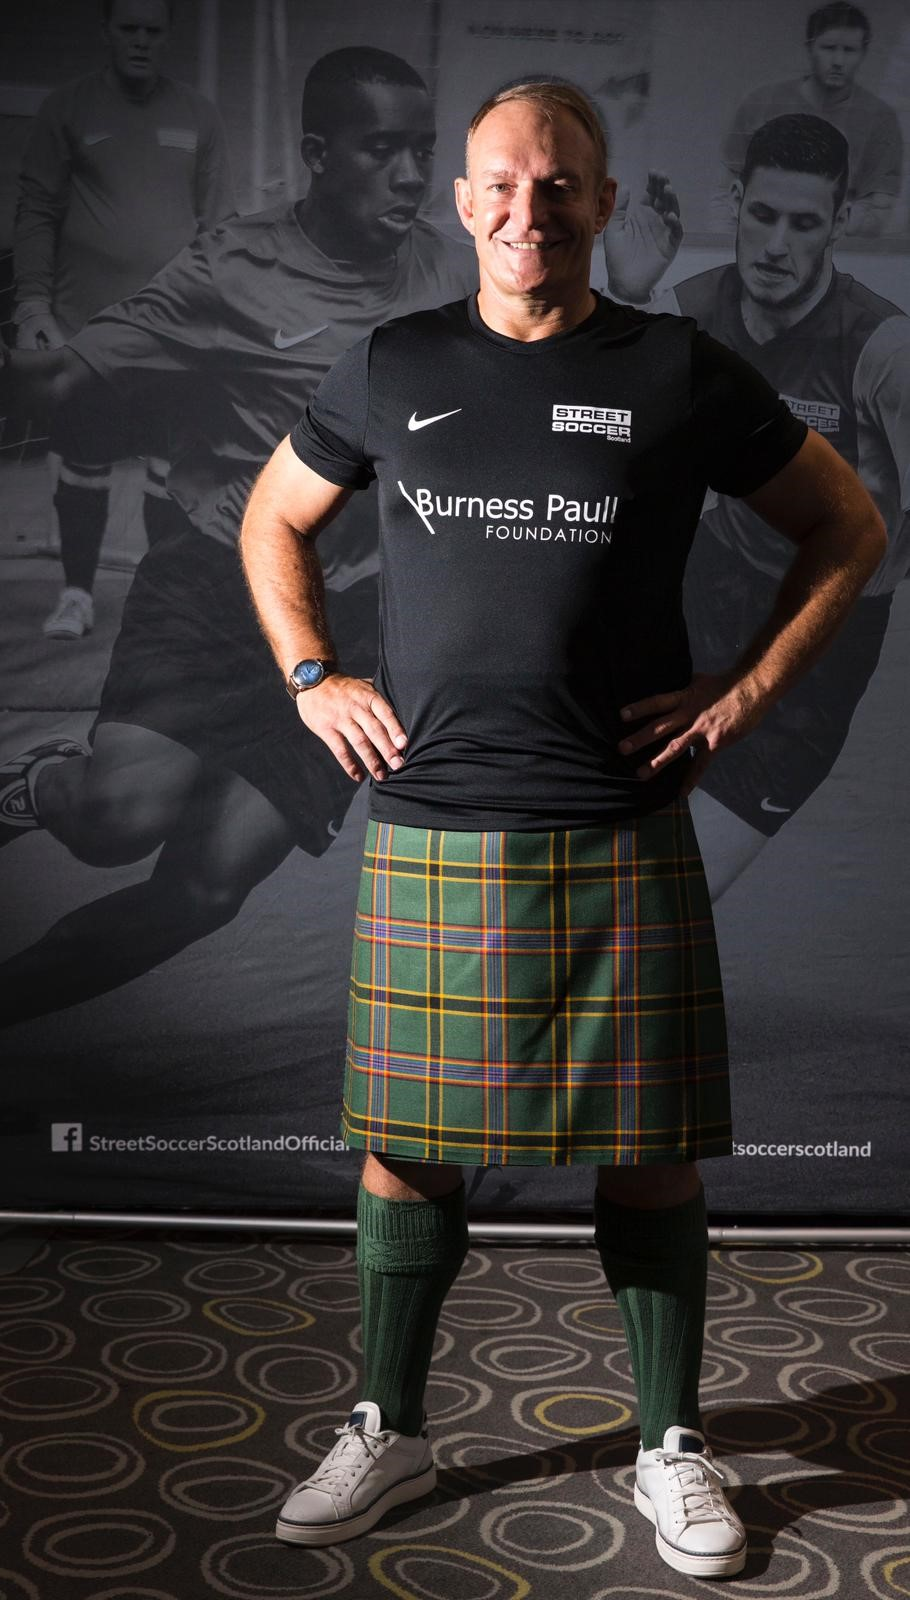 Francois Pienaar Street Soccer Scotland Burness Paull